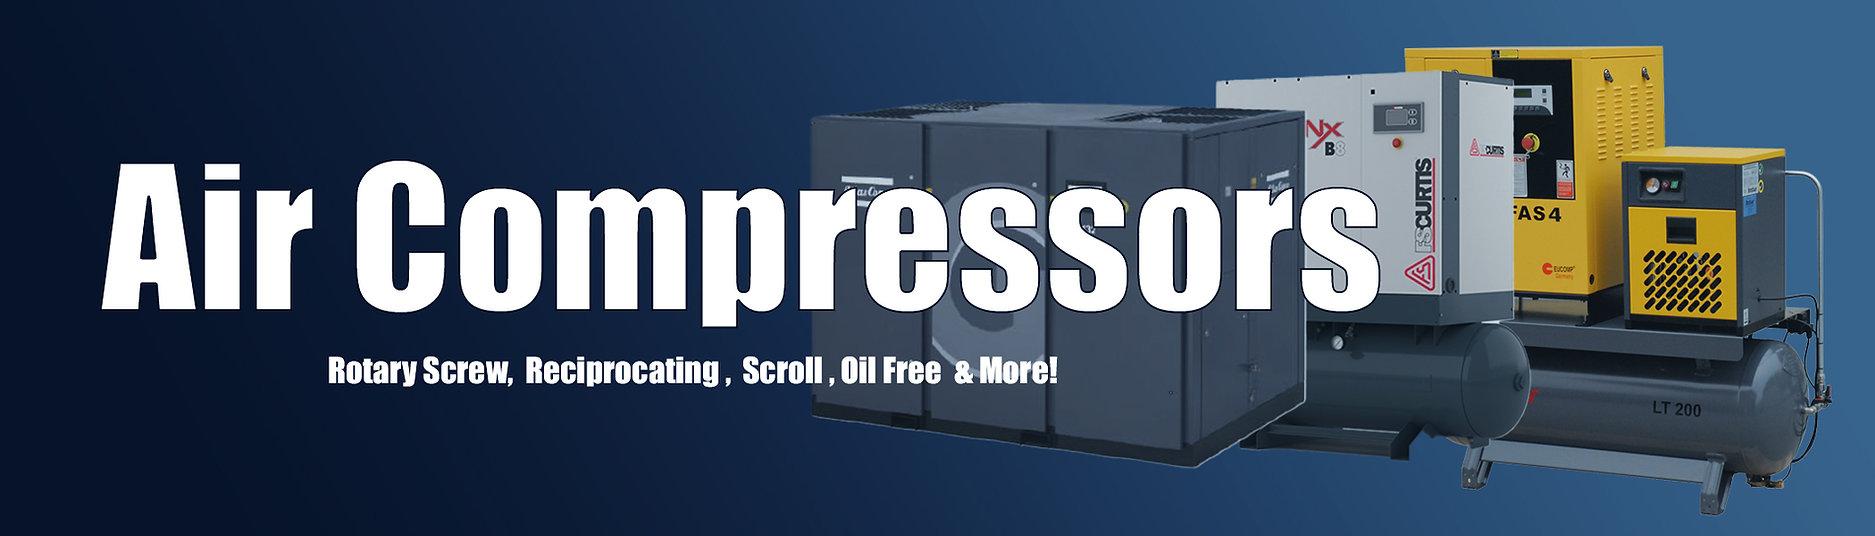 Rotary Screw Air Compressors, Reciprocating Air Compressors, Oil Free Air Compressors , FS Curtis Air Compressors, First Air Air Compressors, Atlas CopCo Air Compressors